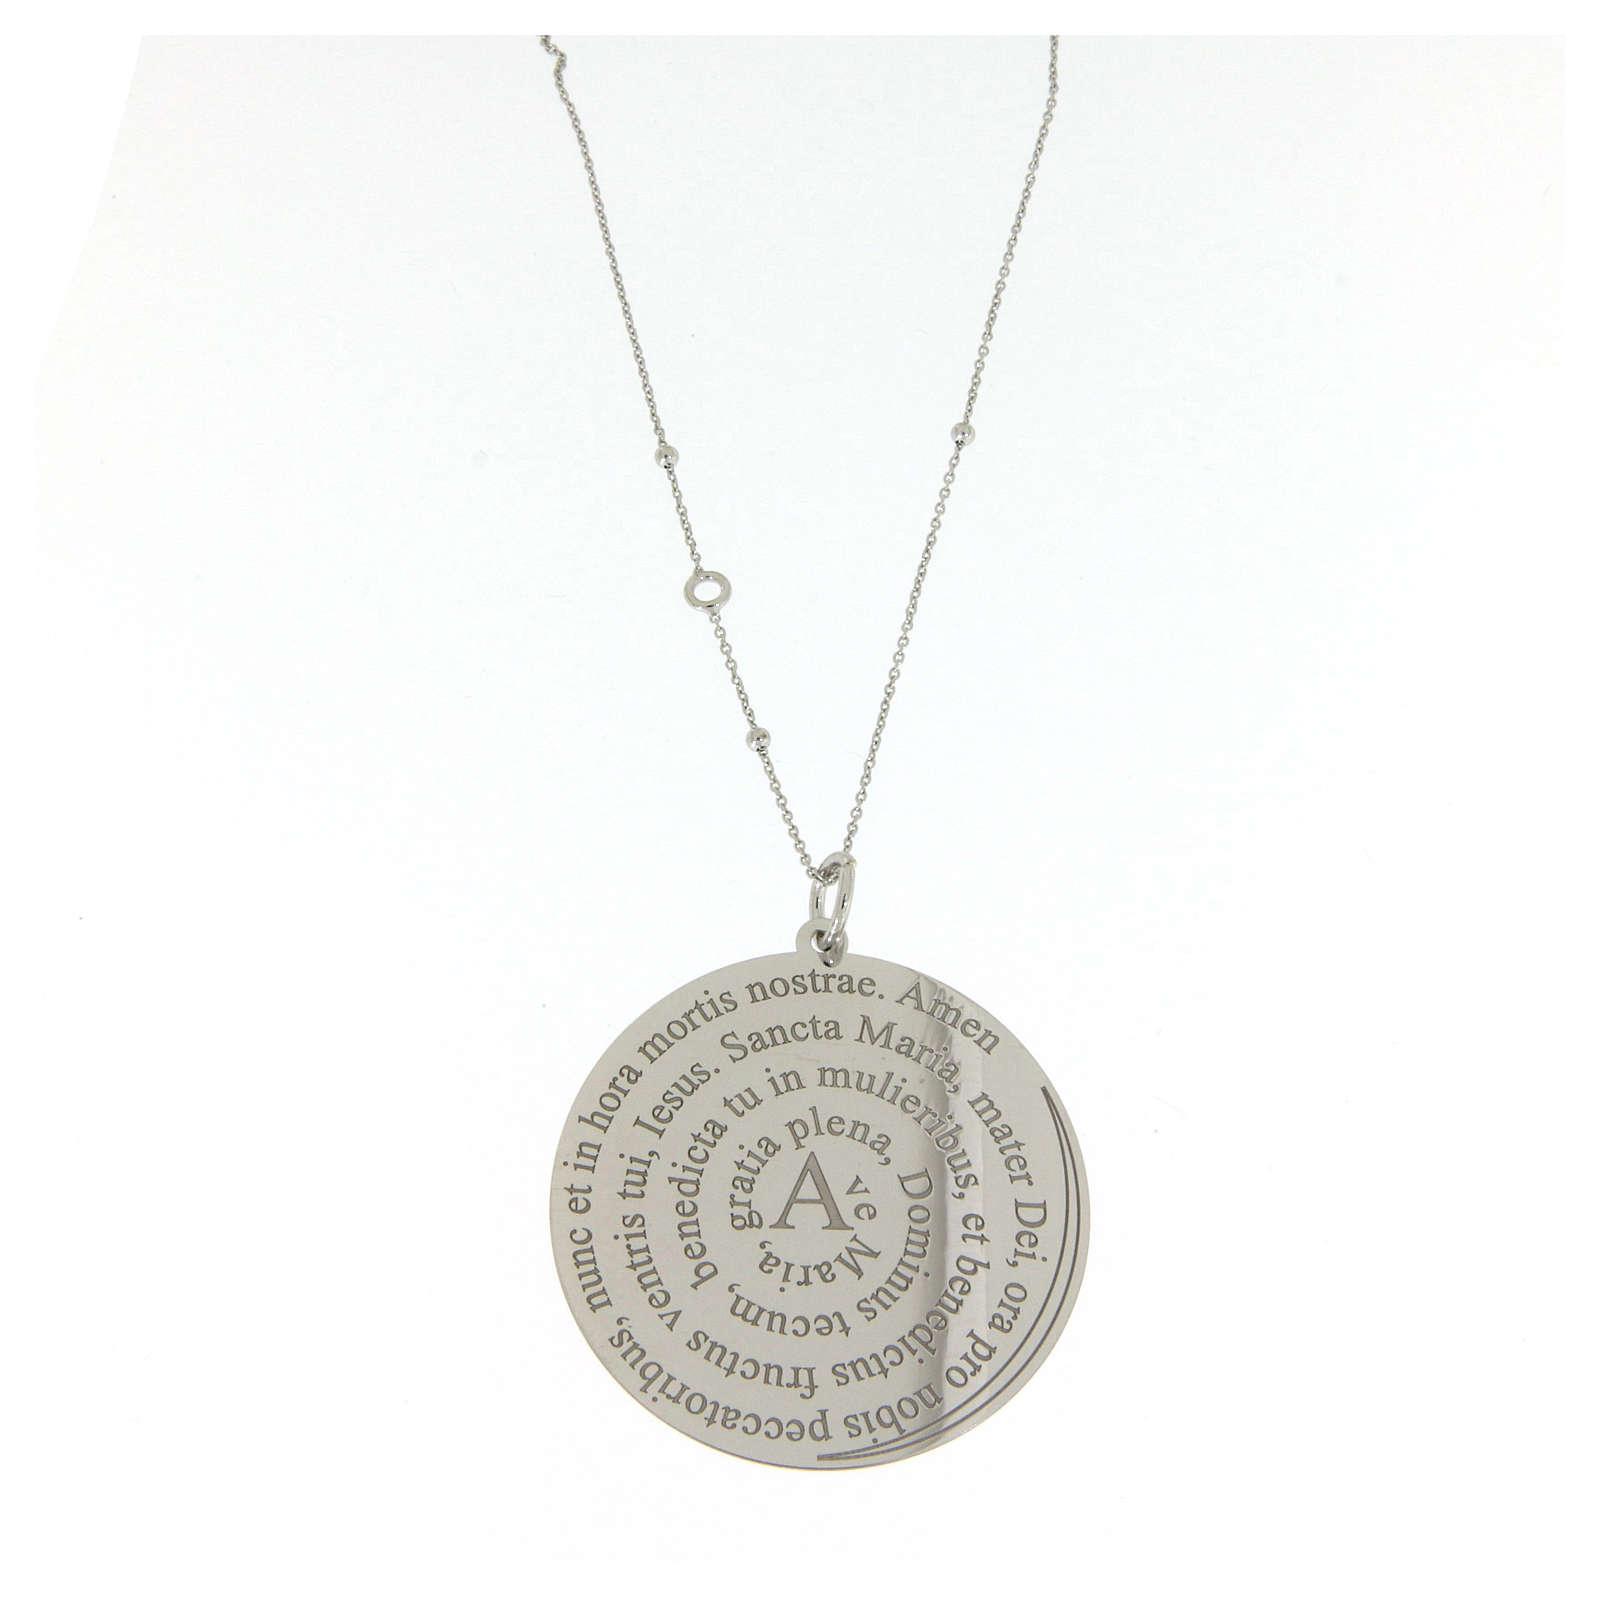 Collier Amen argent 925 Coelis Ave Maria 4